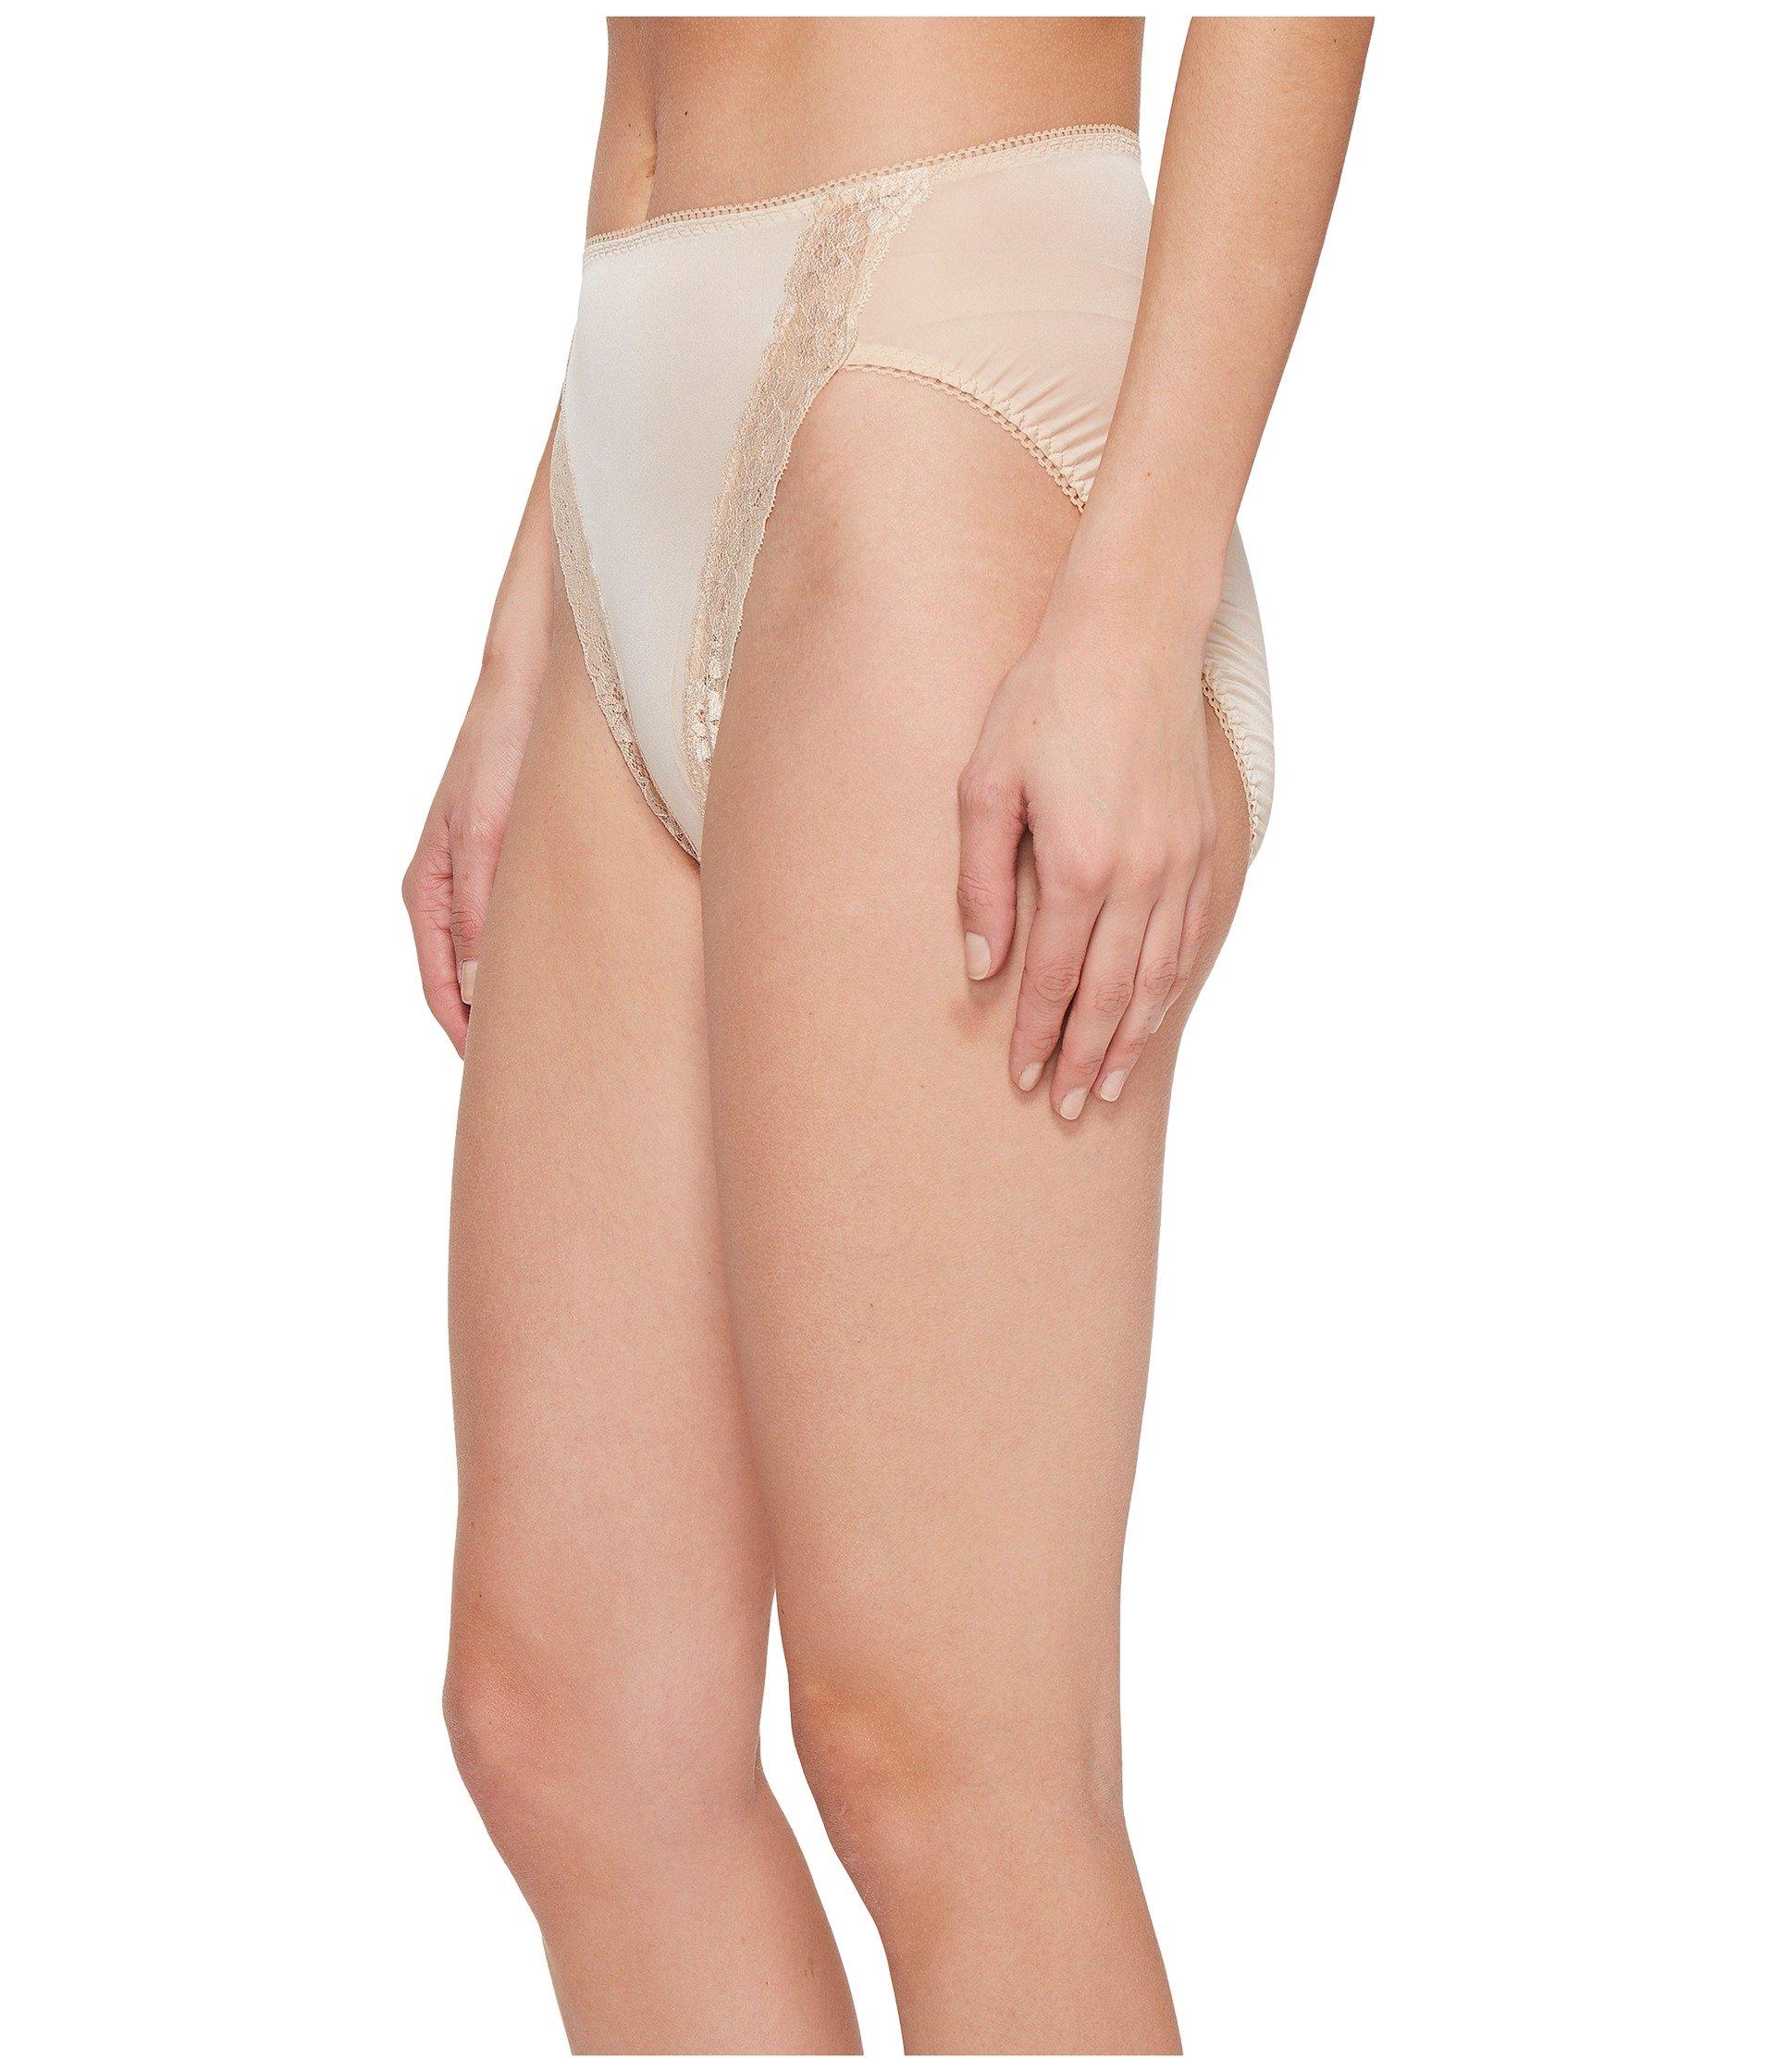 Naturally Bodysuede Brief cut Wacoal Lace Nude Hi C6qwC4x1